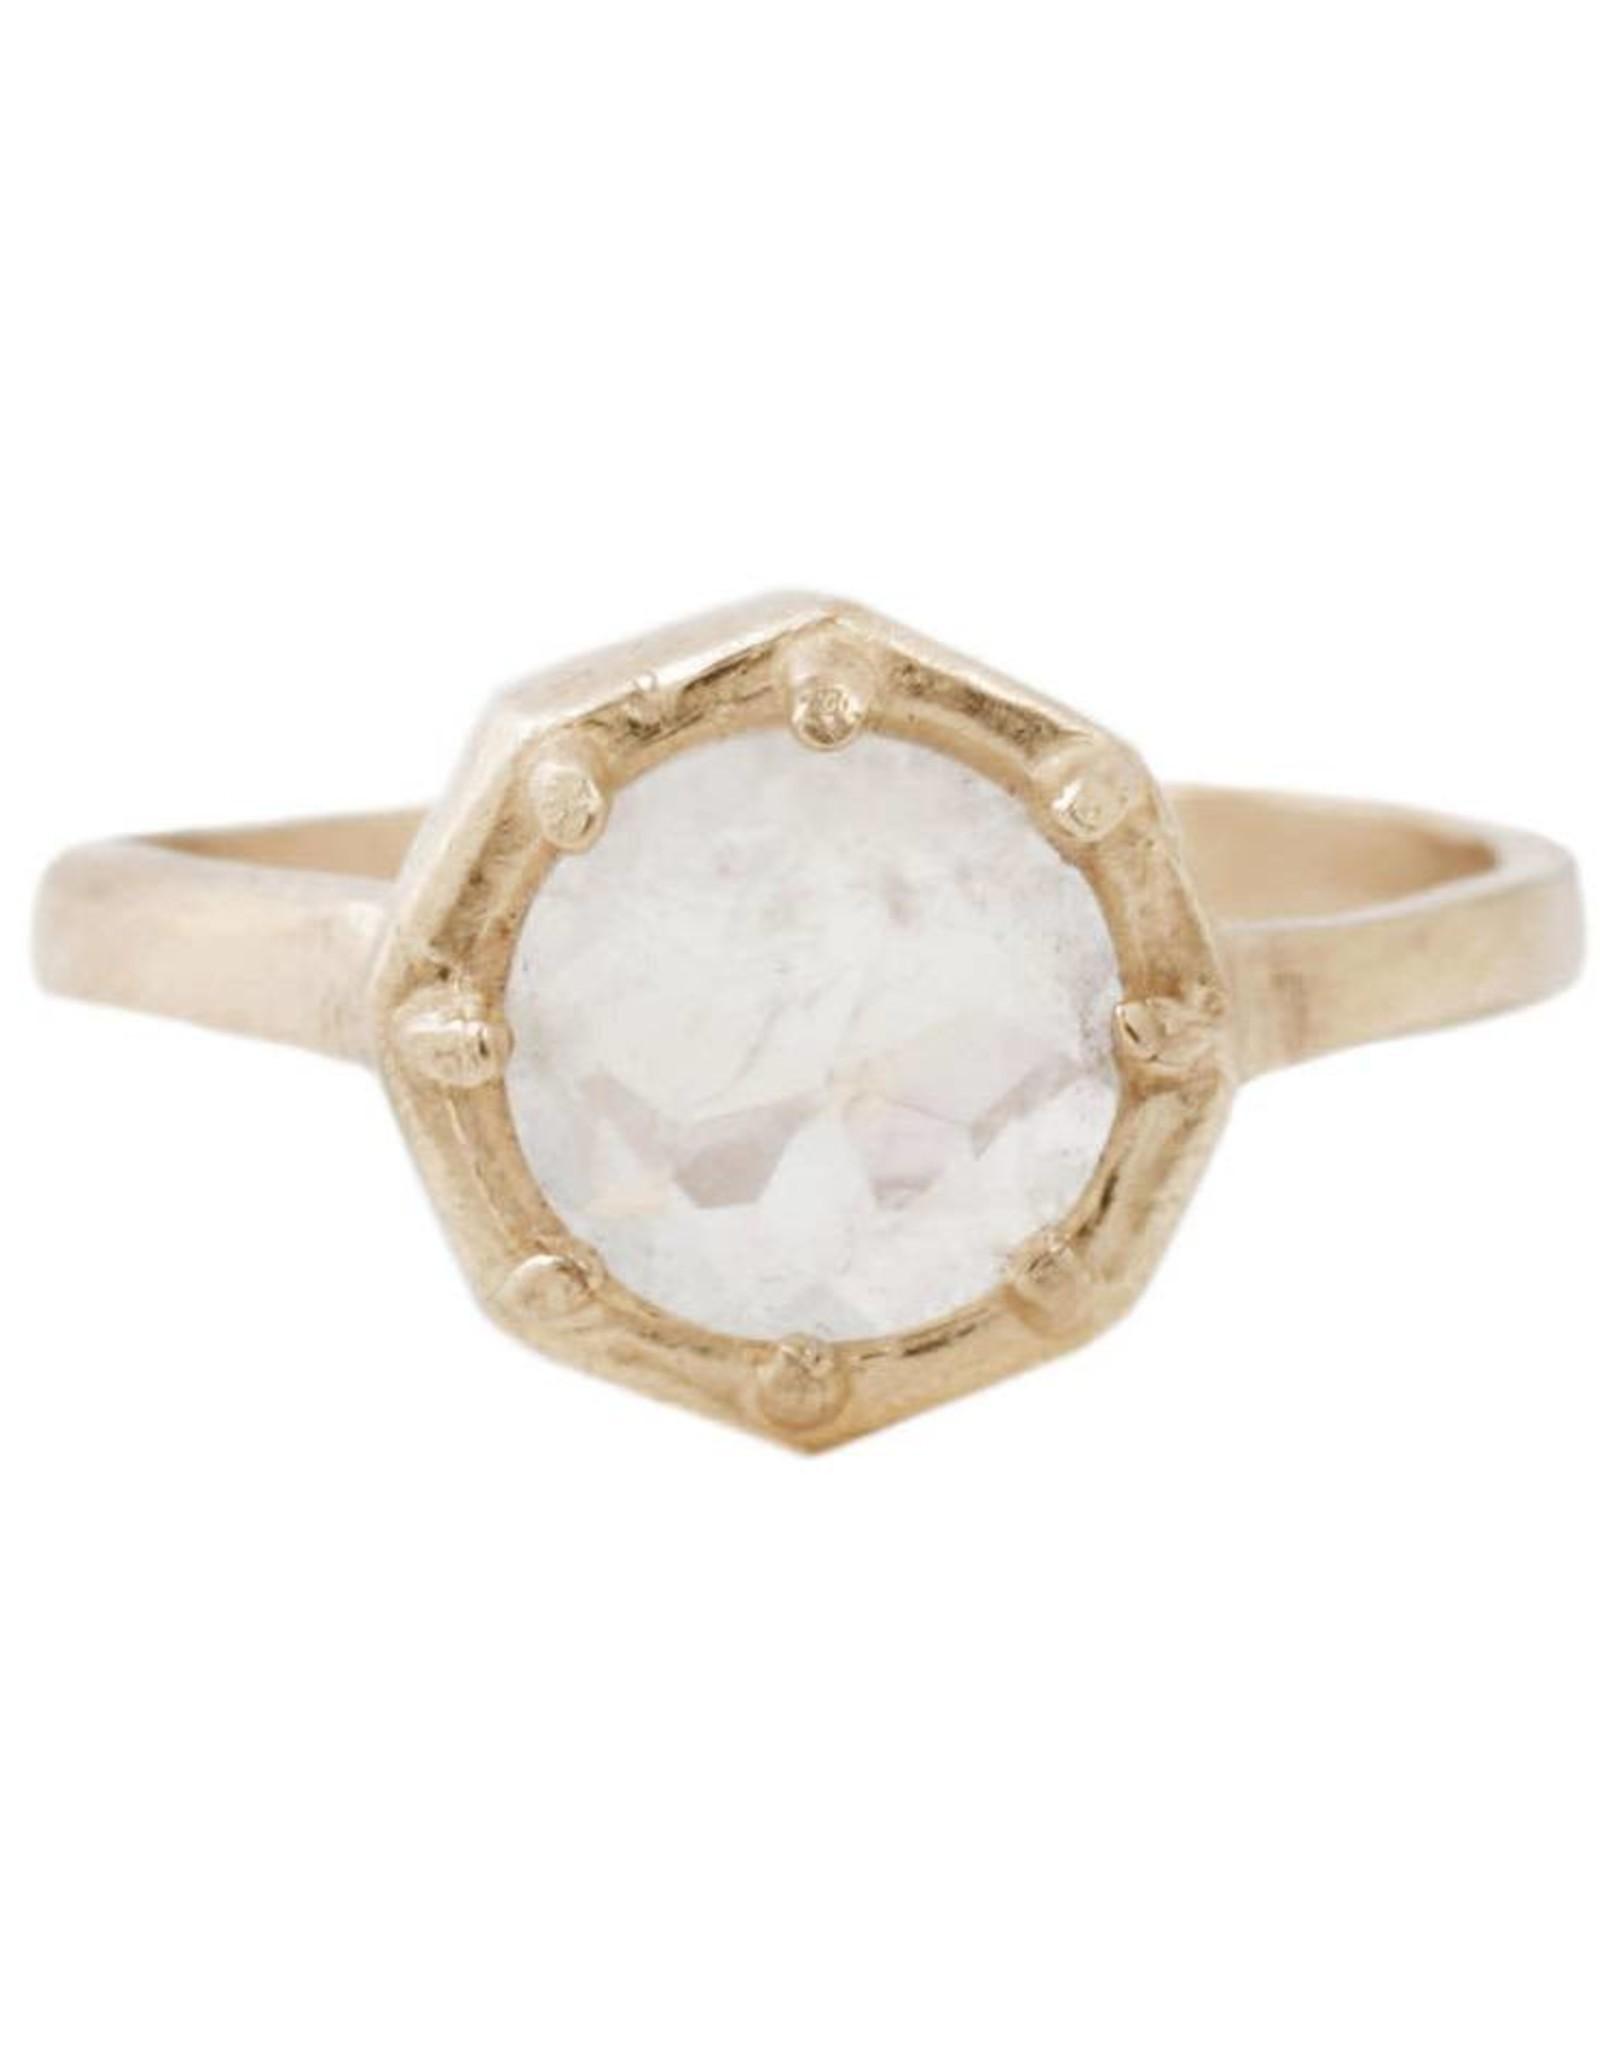 Lauren Wolf Jewelry Gold Octagon Ring - Rainbow Moonstone